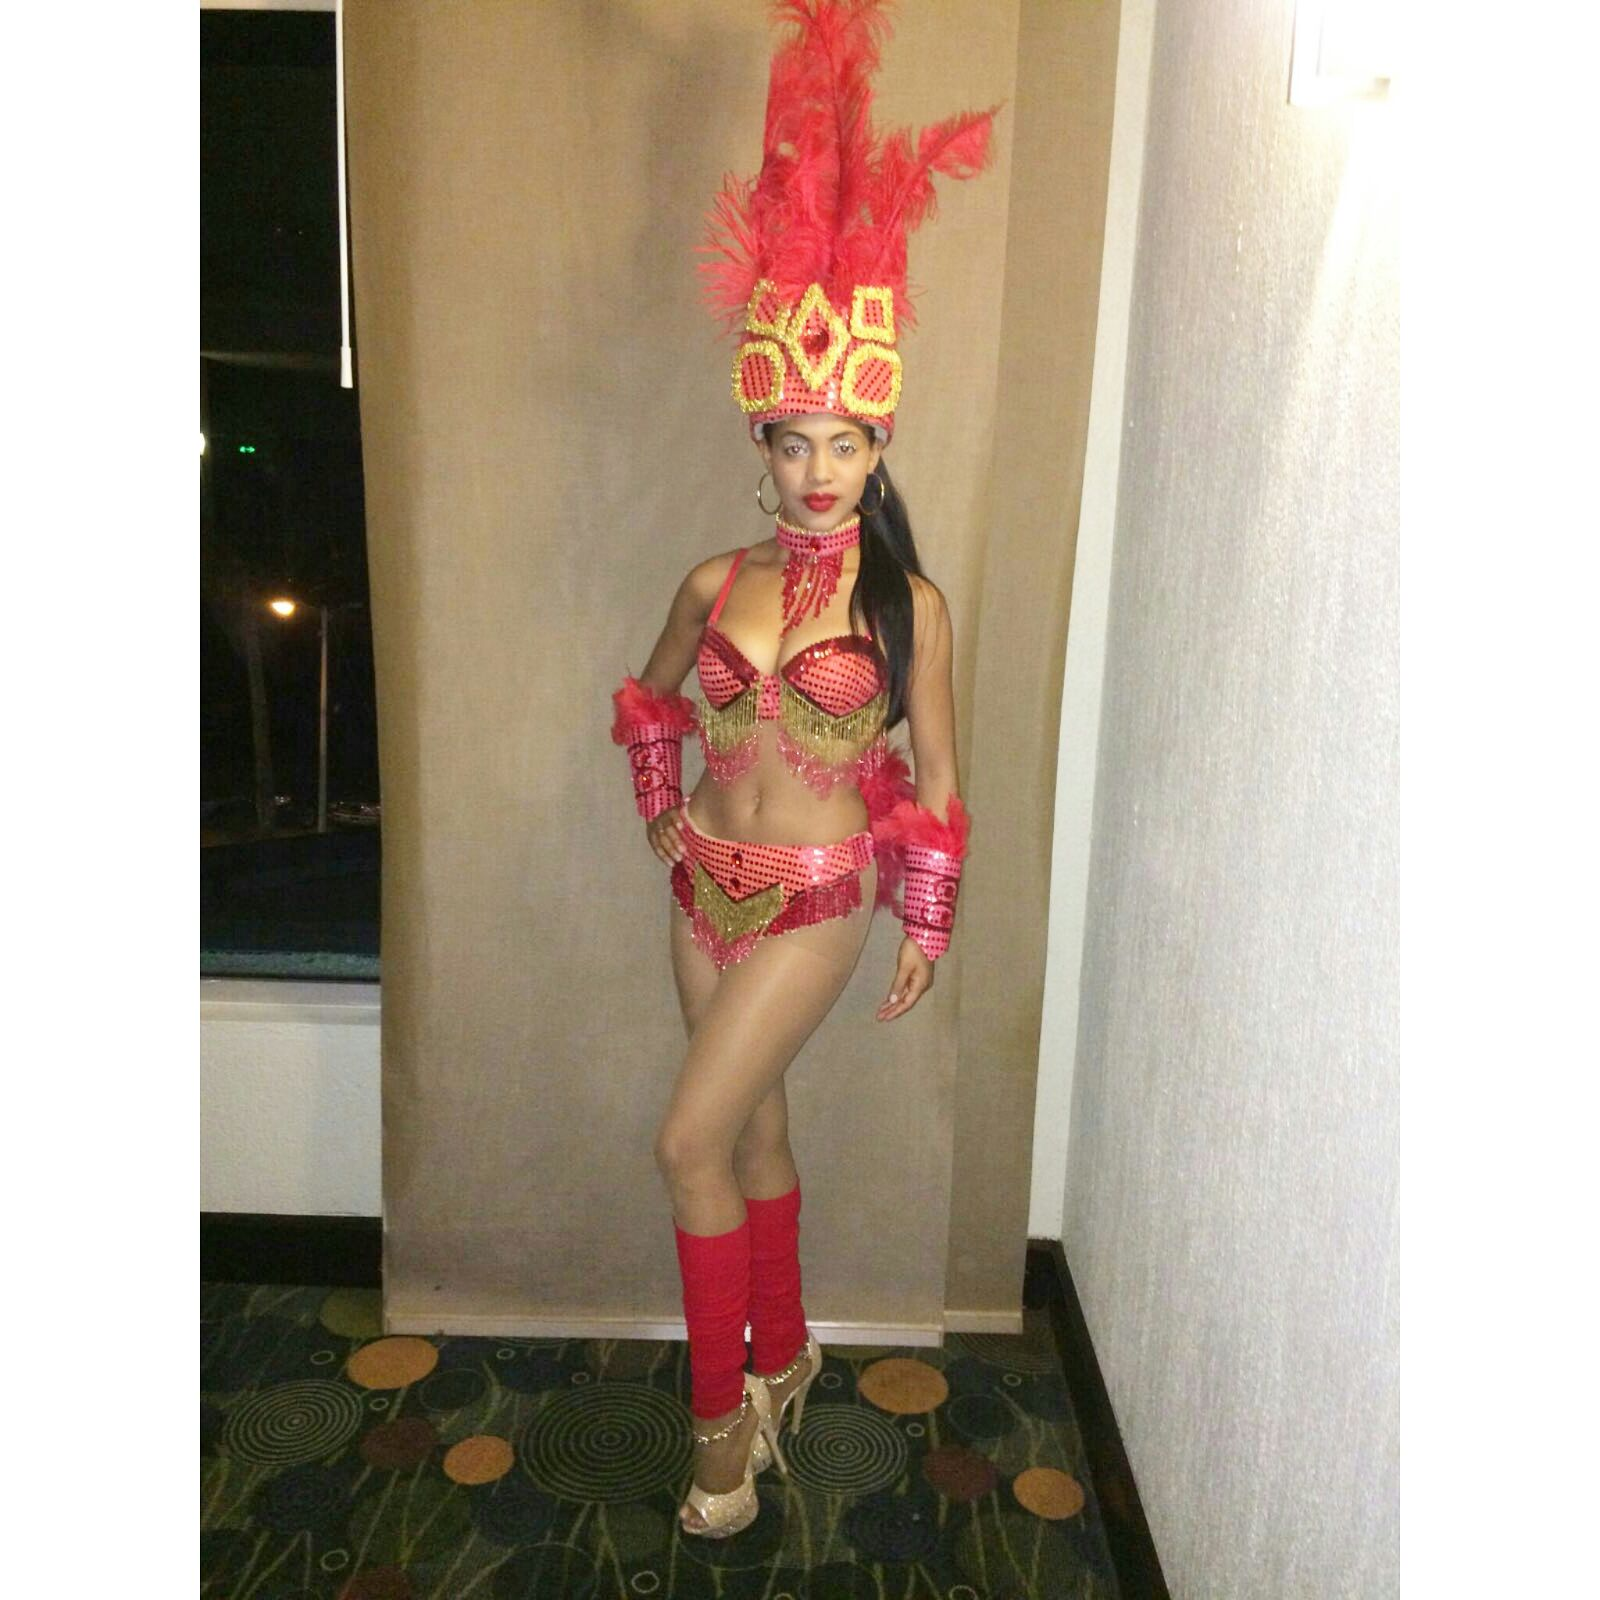 www.Xproevents.com - Bailarina de Samba